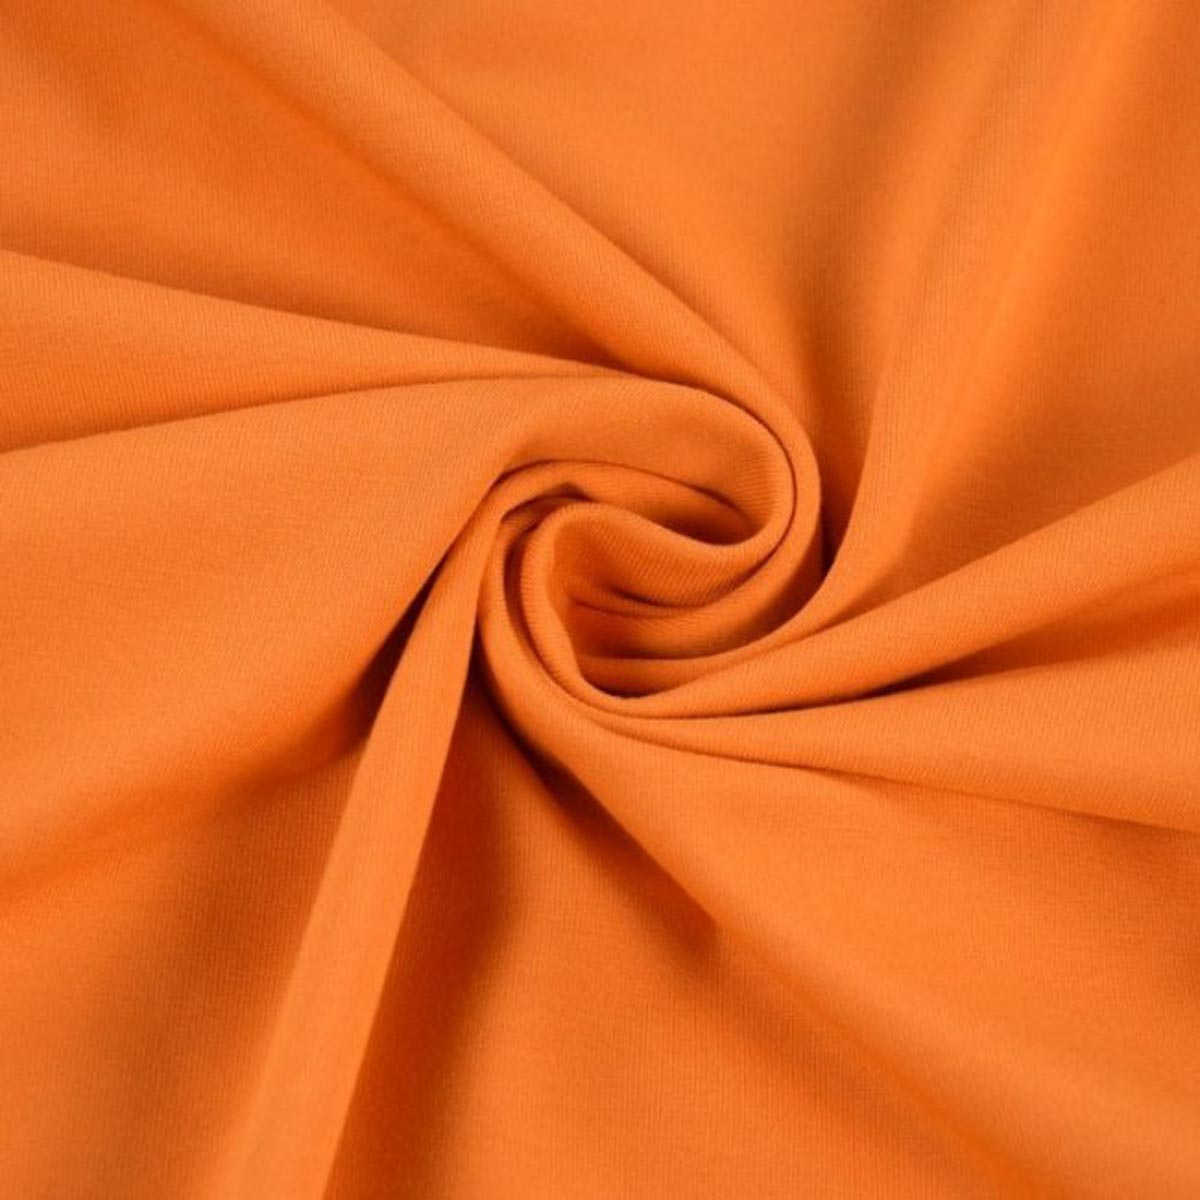 Baumwolljersey uni Meterware dunkel orange 5012